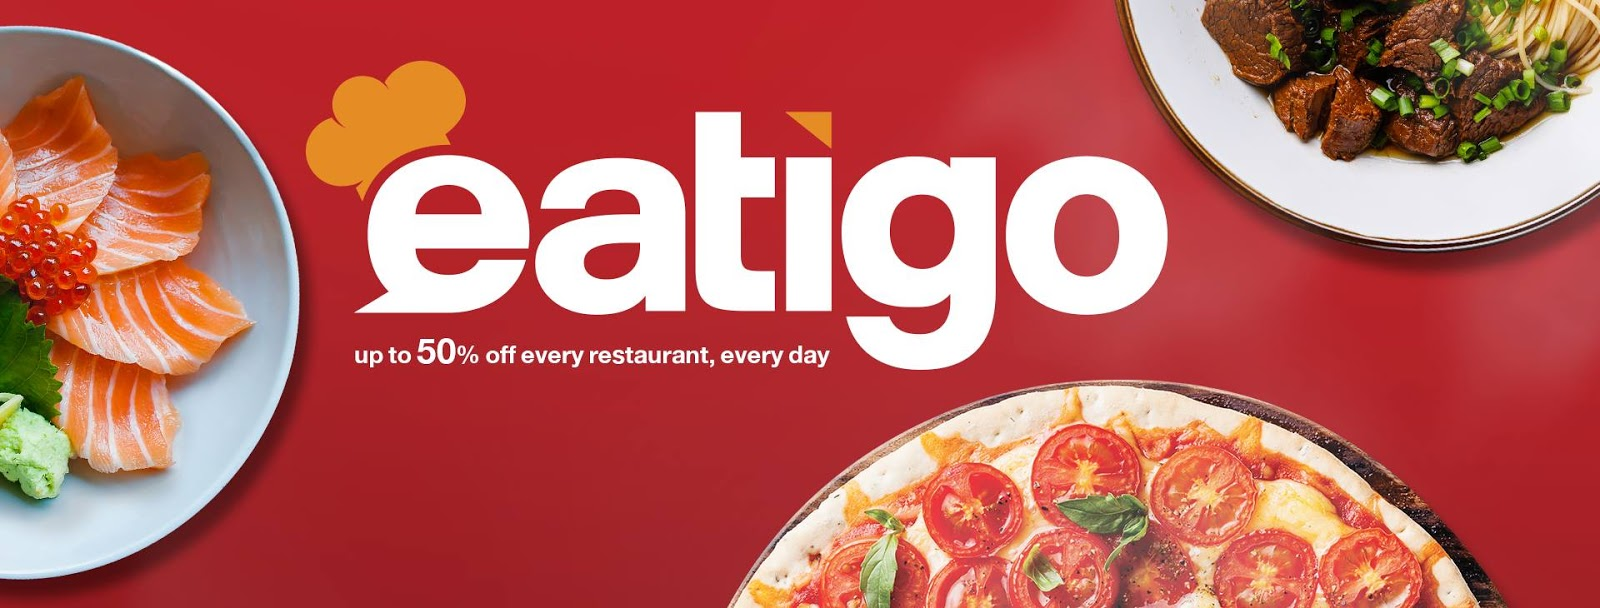 Eatigo Dining Deals And Online Restaurant Reservation For